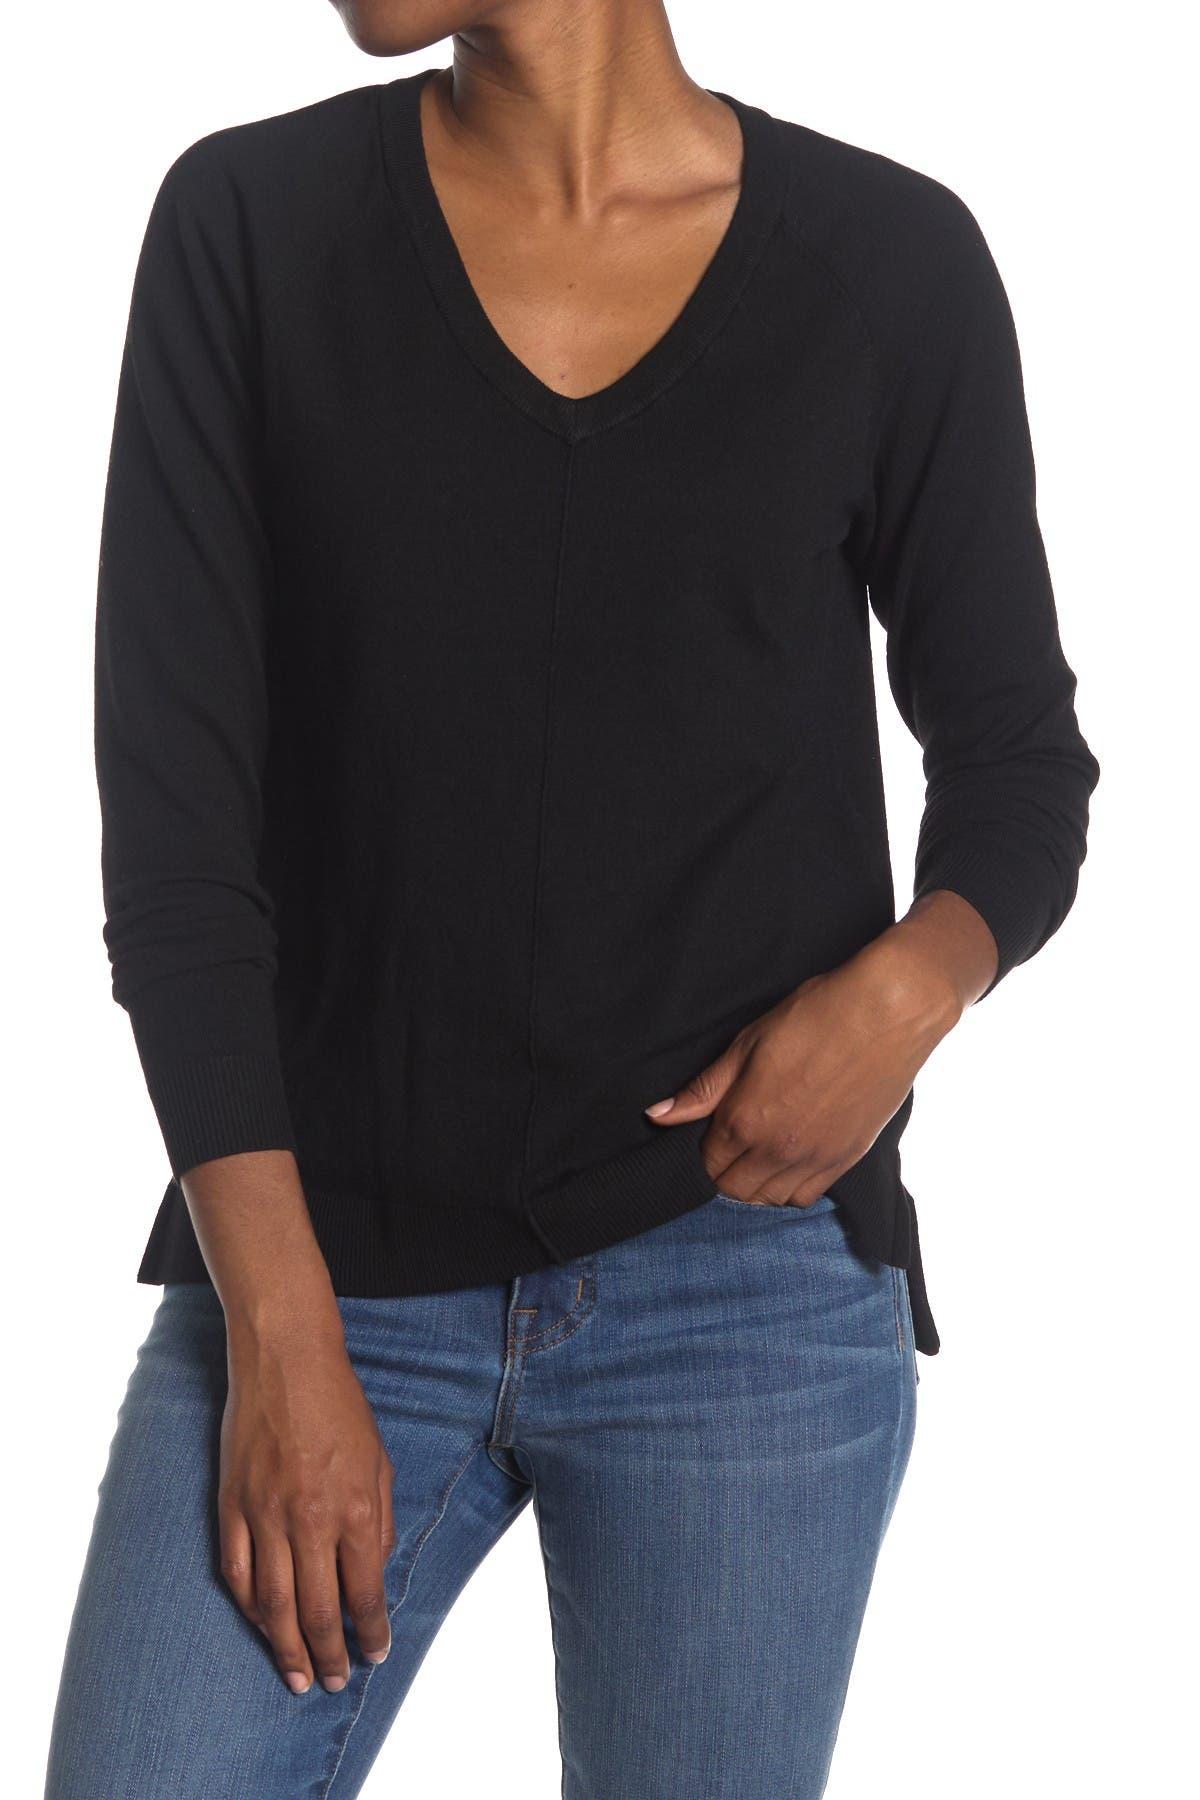 Image of Bobeau V-Neck Knit Pullover Sweater